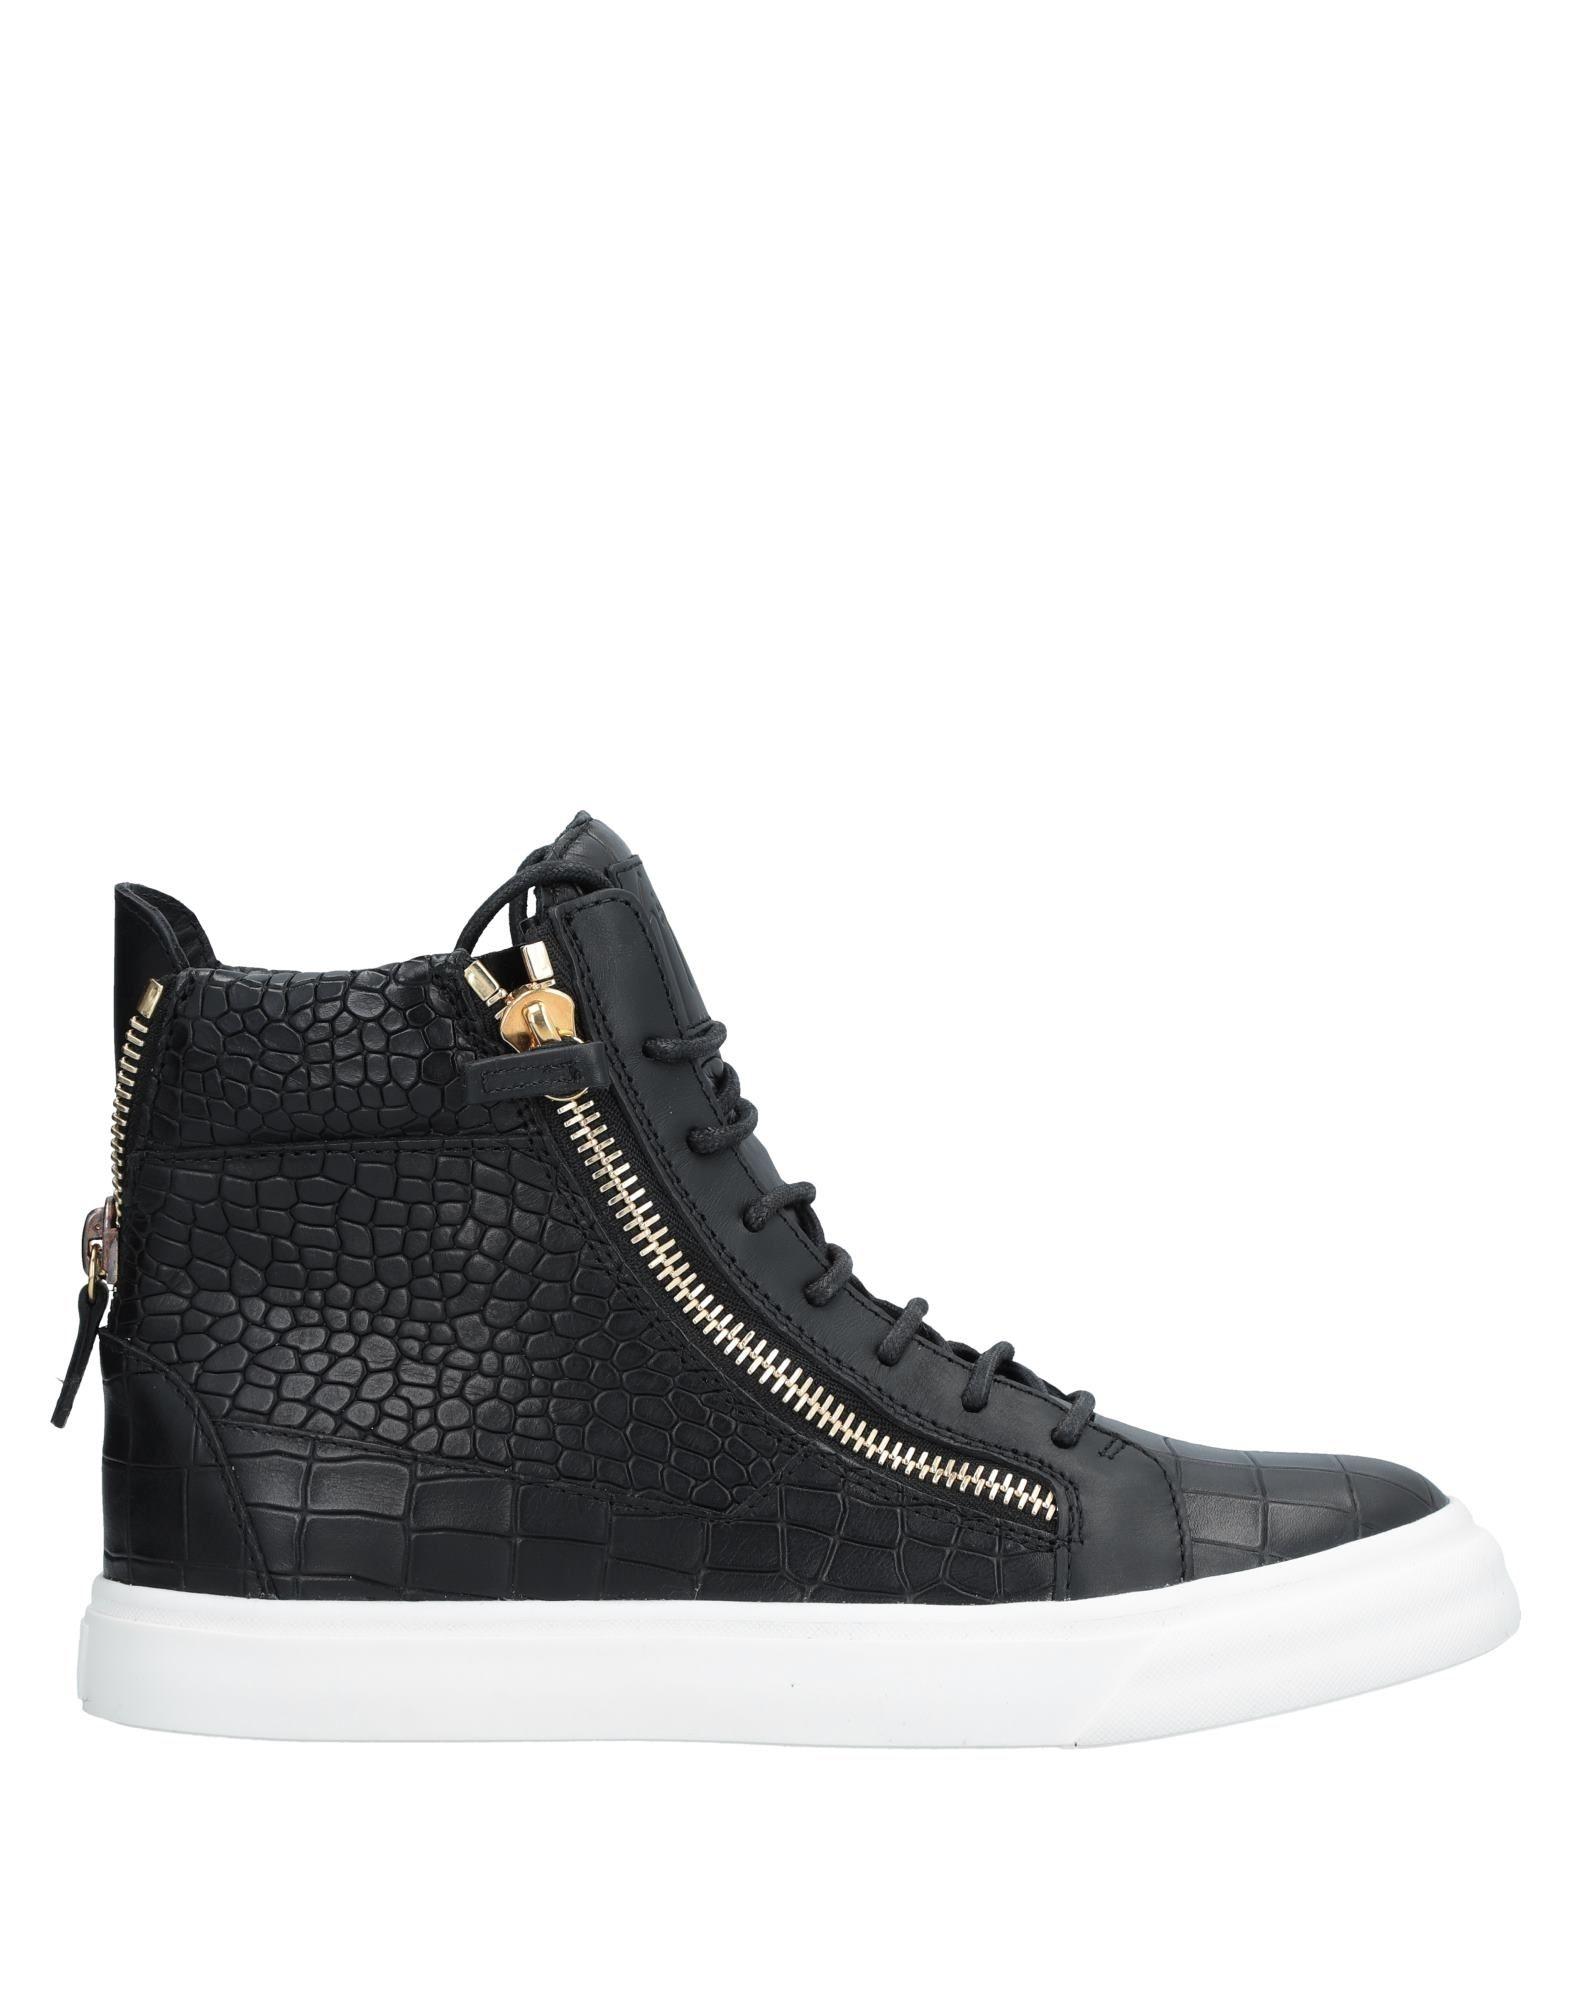 Giuseppe Zanotti Sneakers Sneakers - Women Giuseppe Zanotti Sneakers Sneakers online on  United Kingdom - 11107240VB 7c2f0b